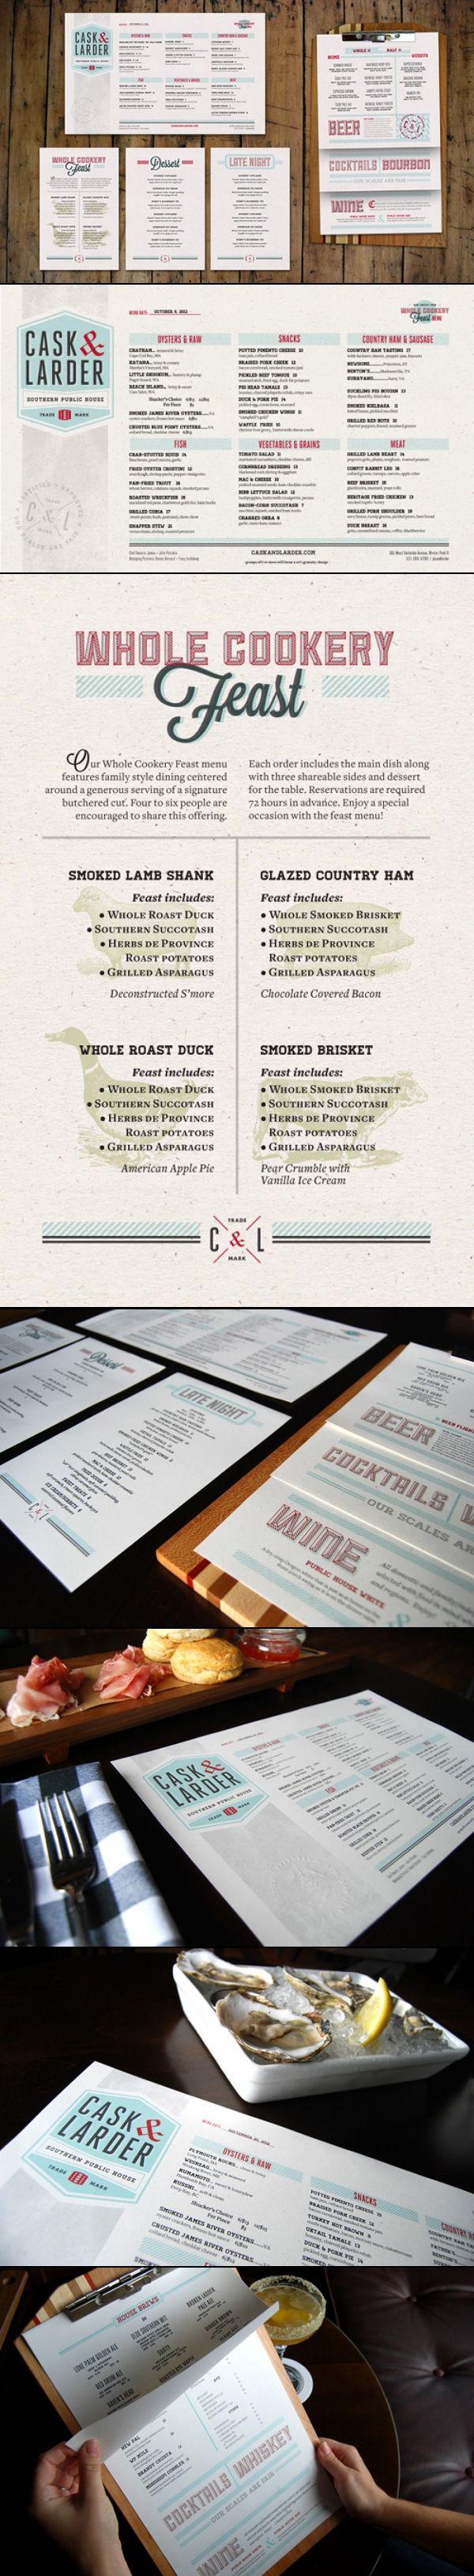 60 best EDITORIAL / Menu images on Pinterest | Brand identity design ...